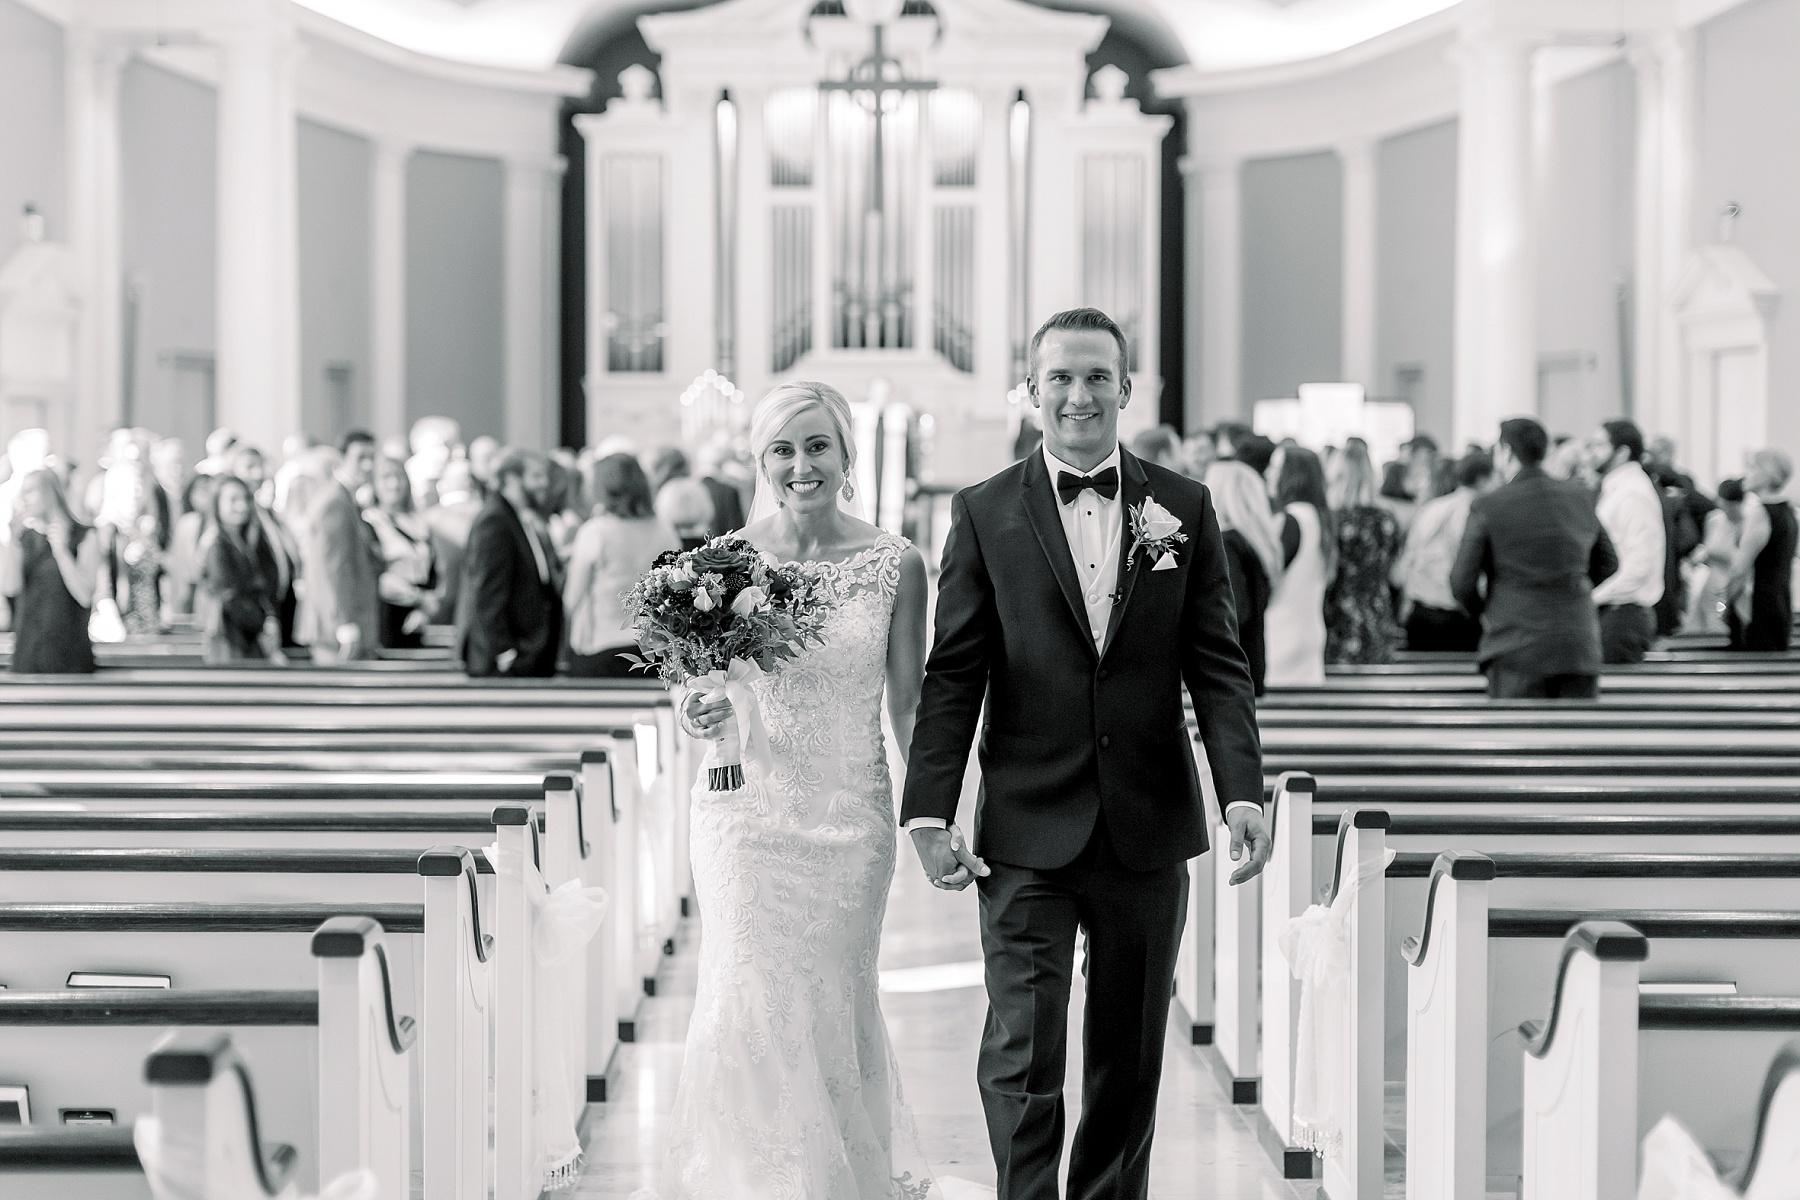 midwest-adventurous-wedding-photographer-elizabeth-ladean-photography-photo_4785.jpg